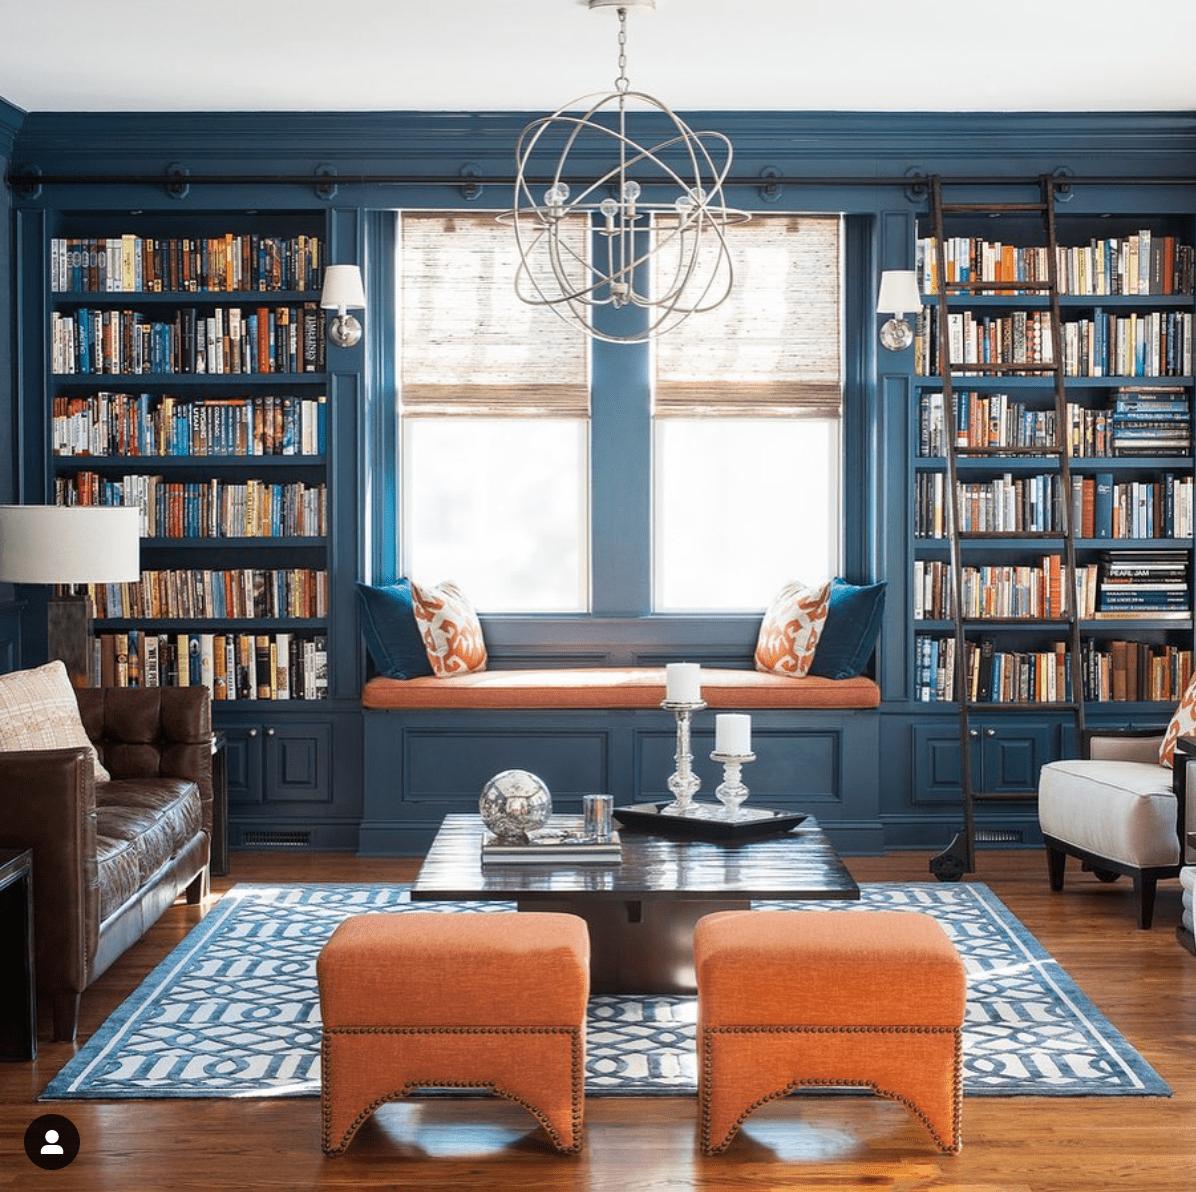 Benjamin Moore Newportbury Blue - Cory Connor Designs - dark blue paint in a study